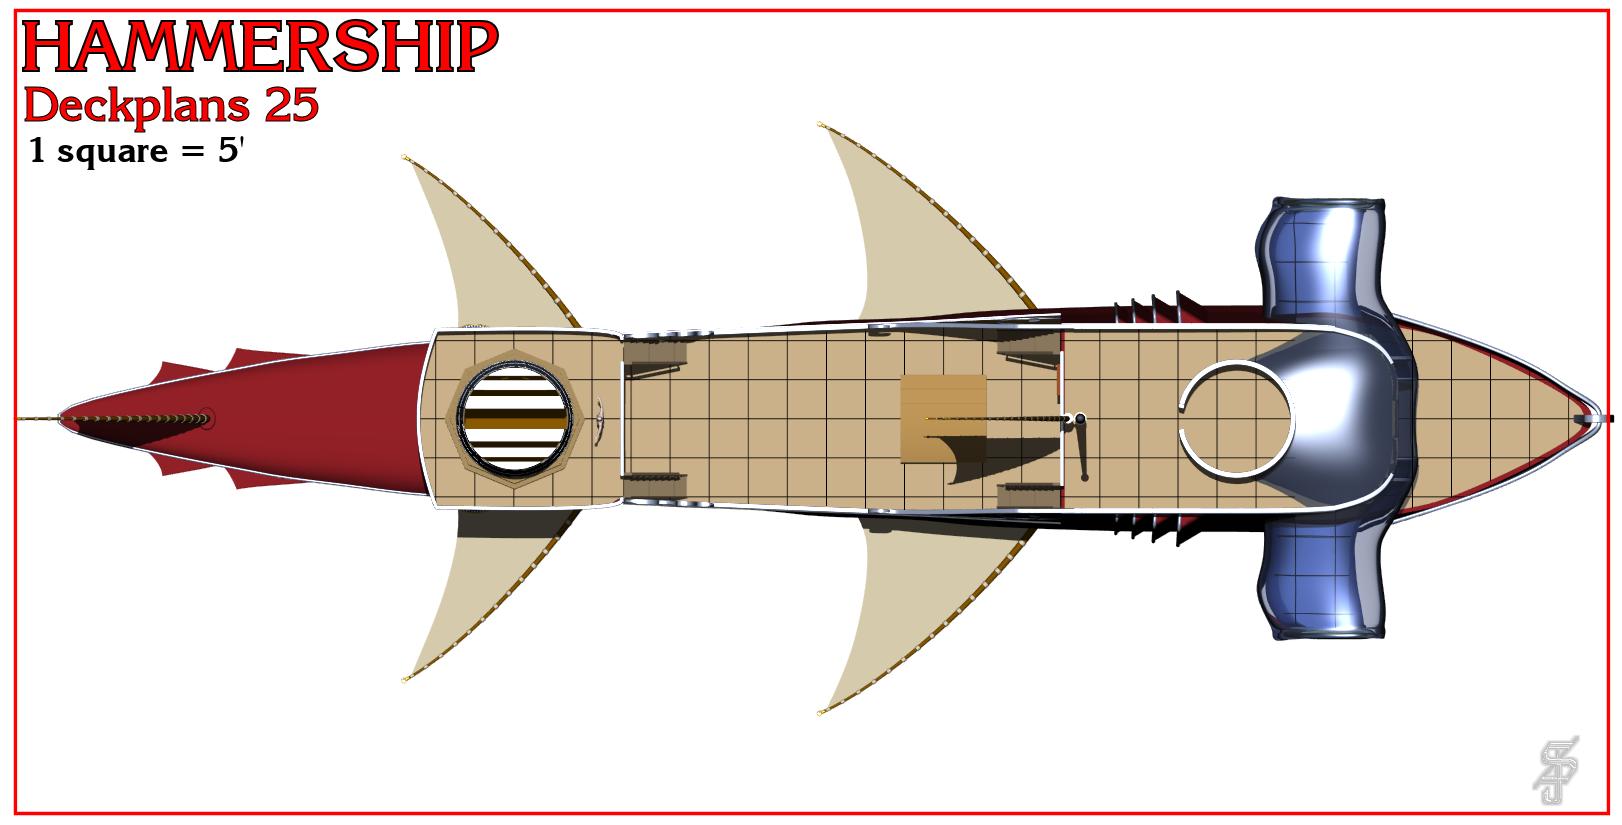 Hammership layout 25